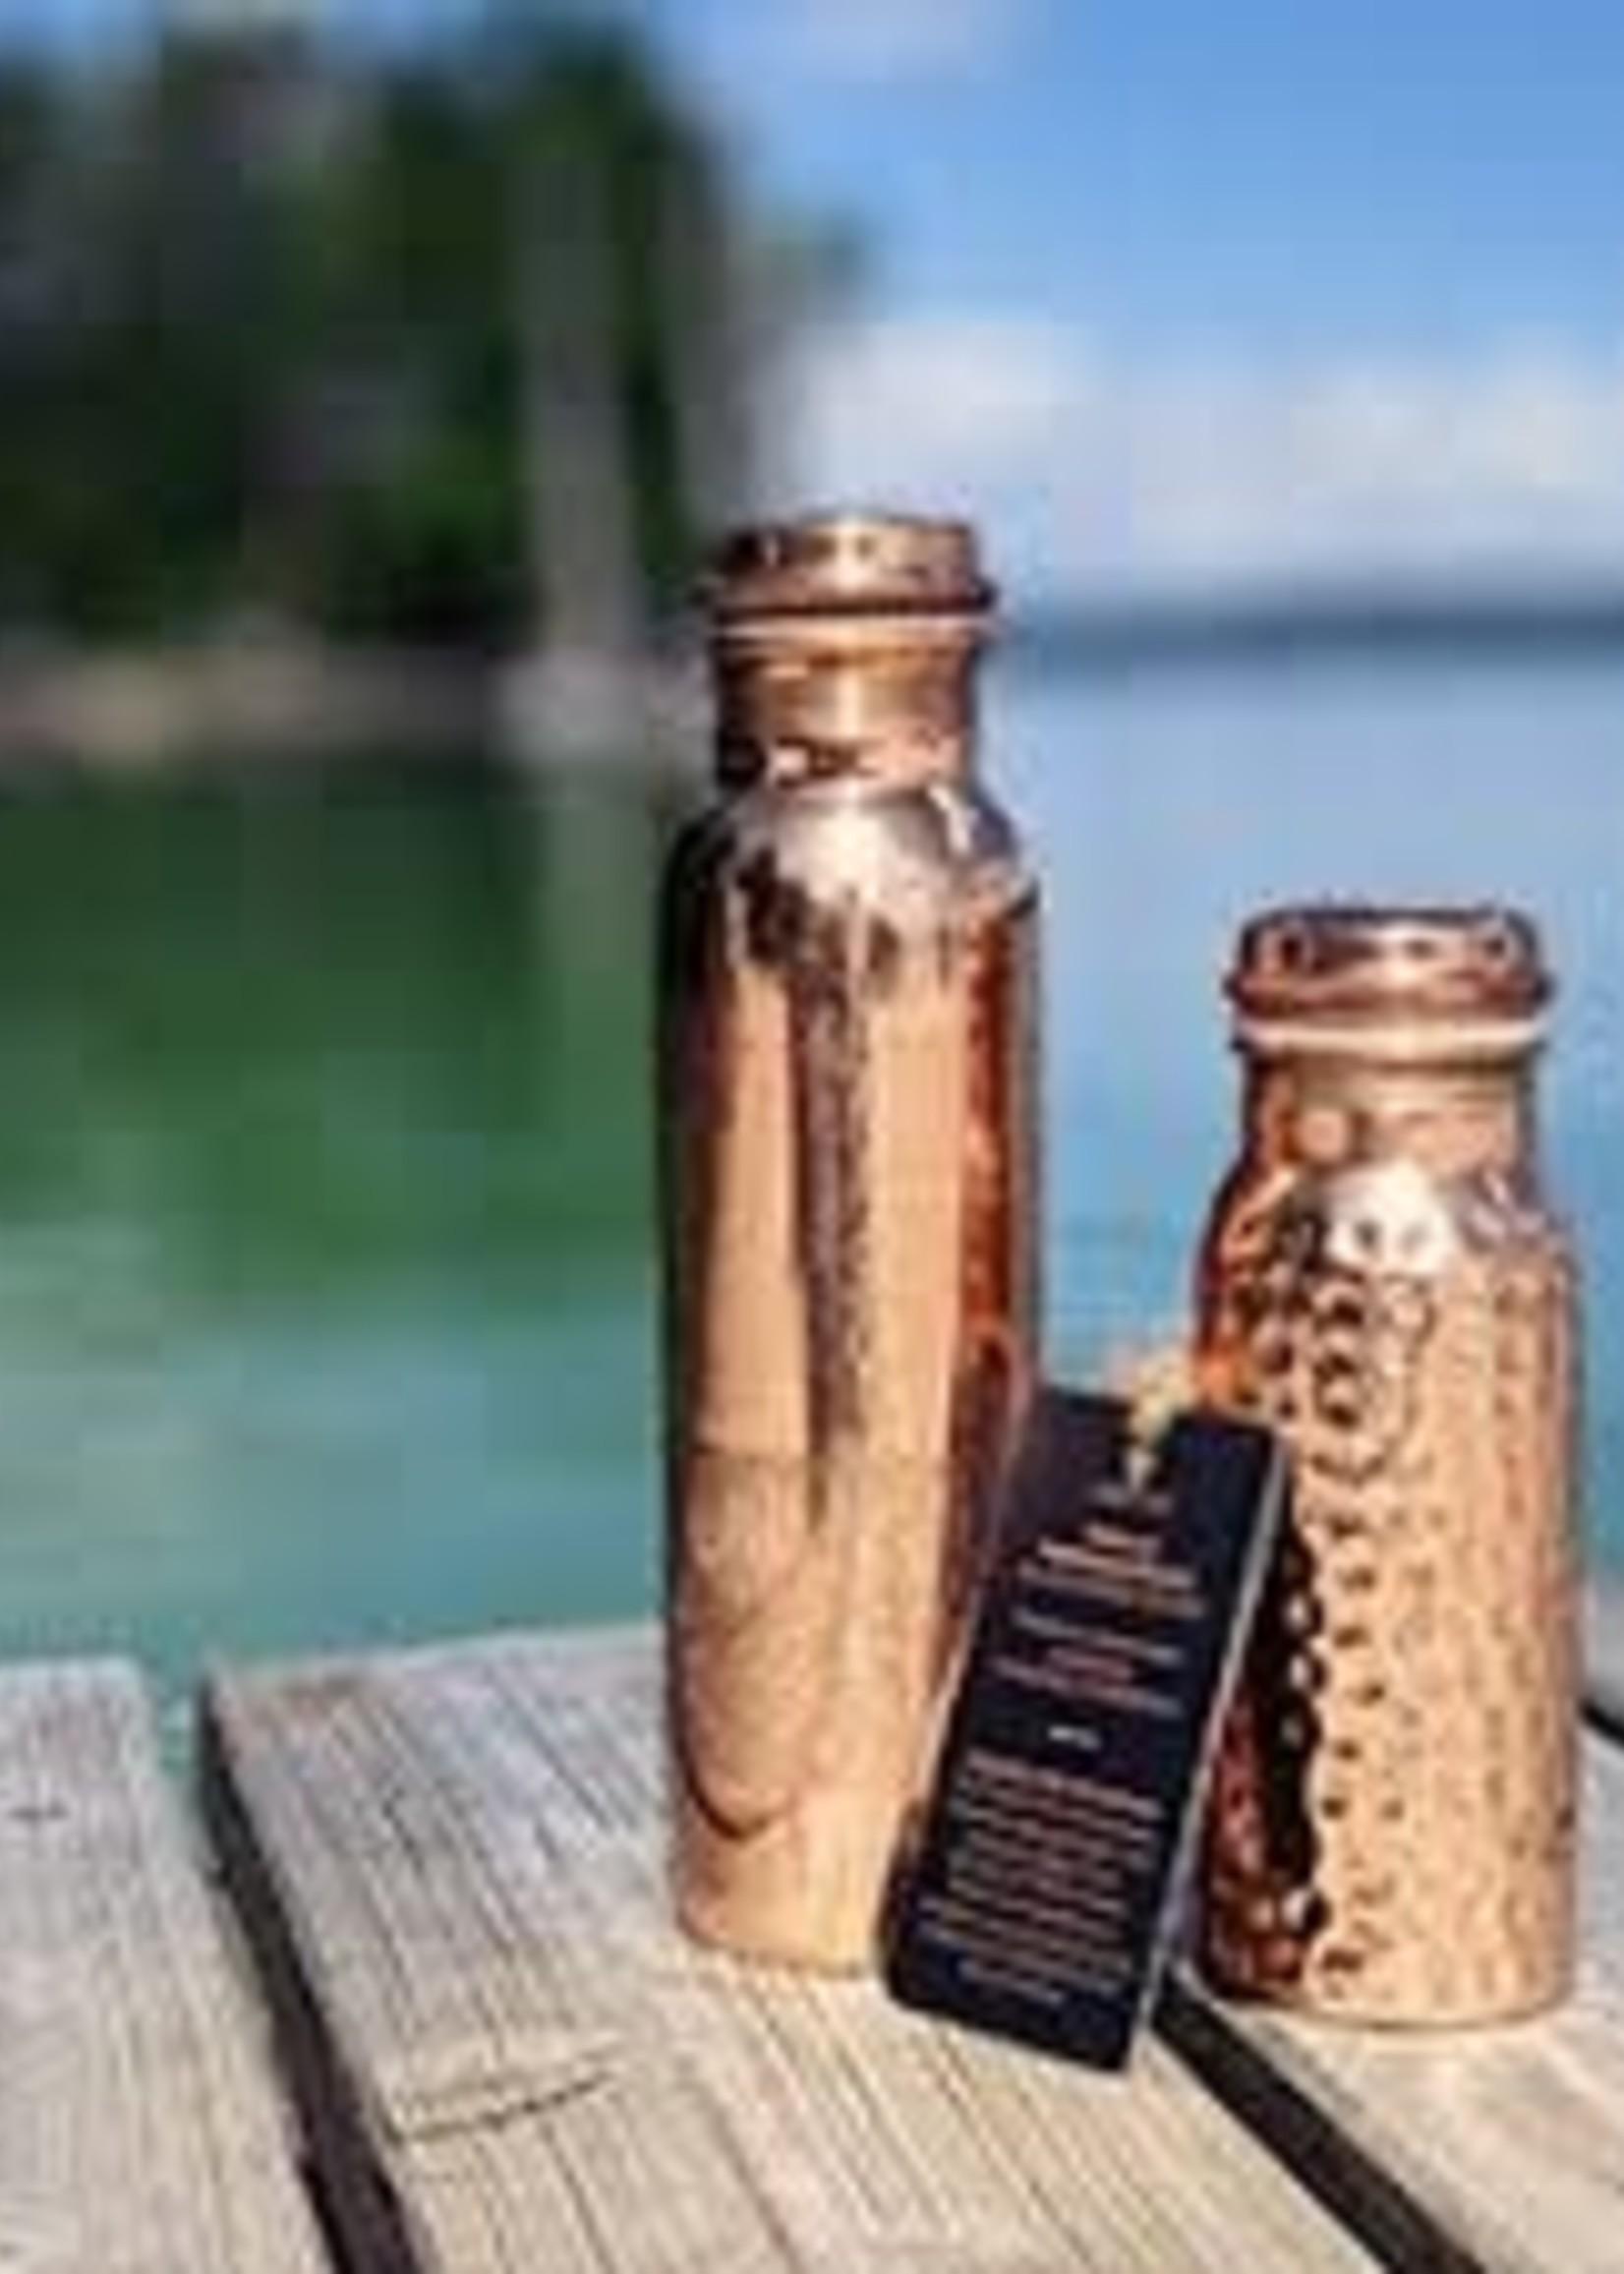 Forrest & Love Forrest & Love - Copper Luxury engraved water bottle.900 ml